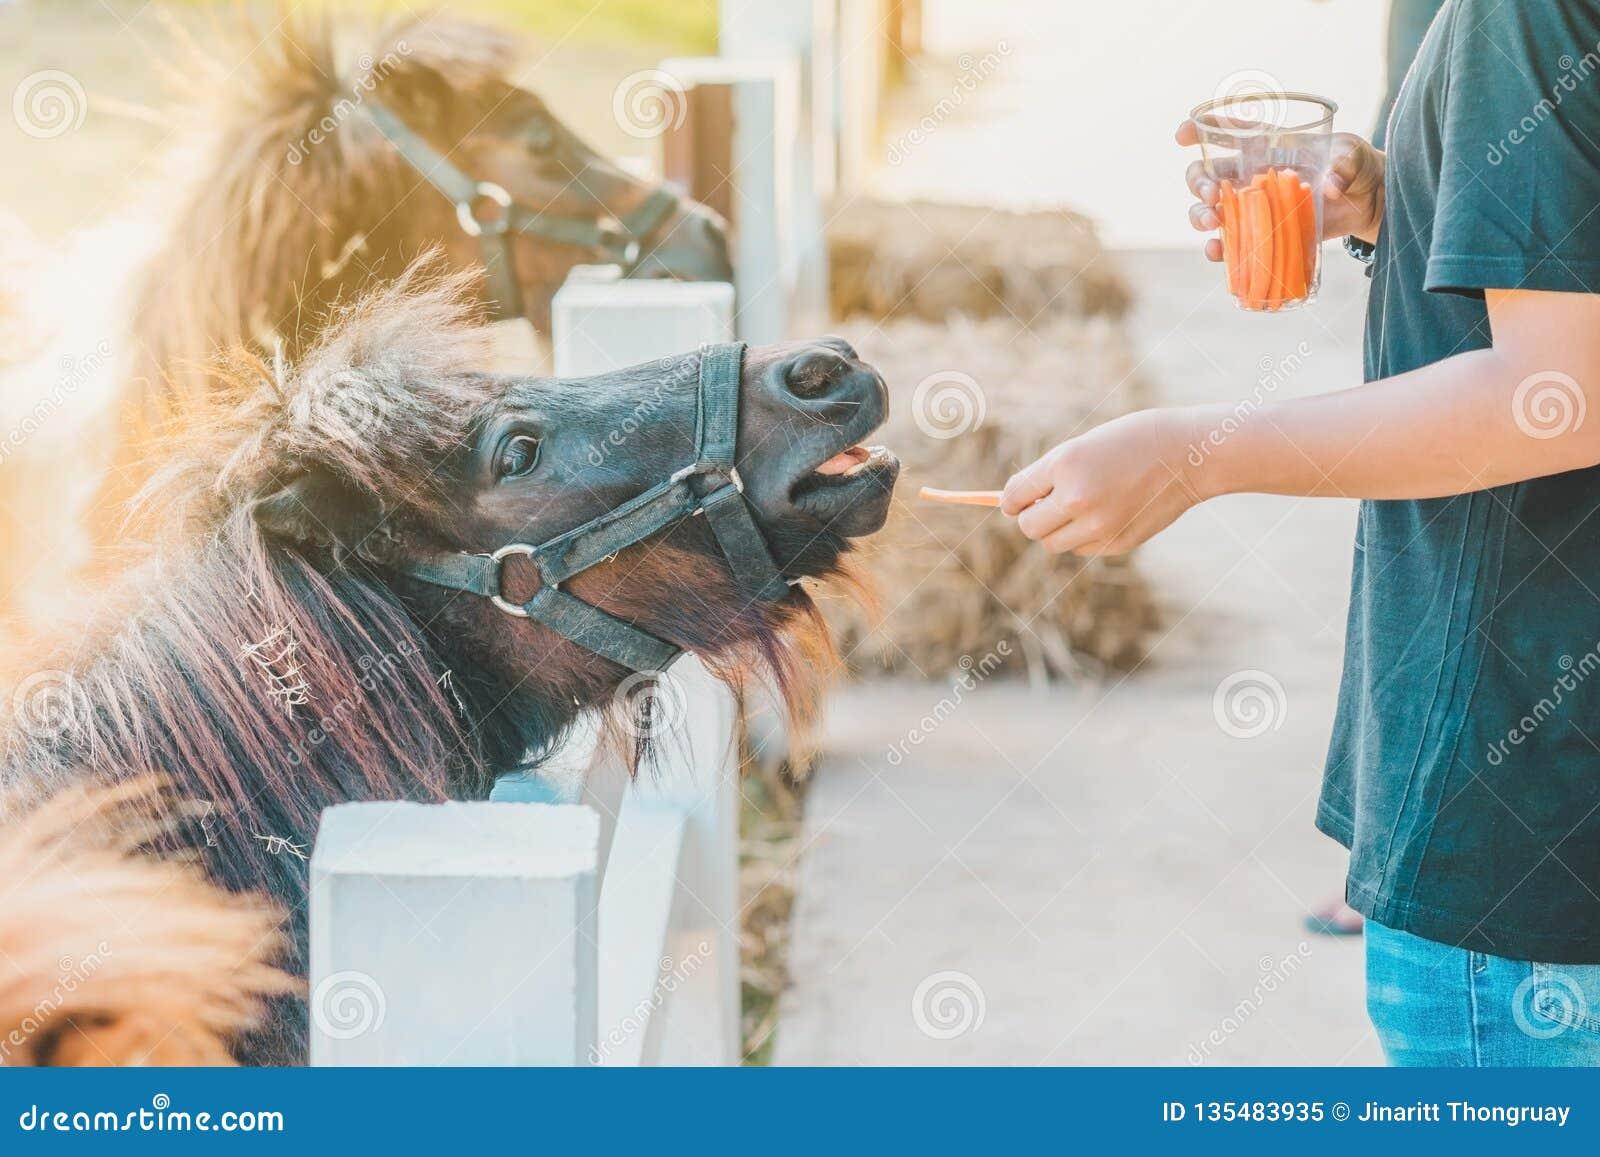 Boy feeding horse in his farm through a white fence